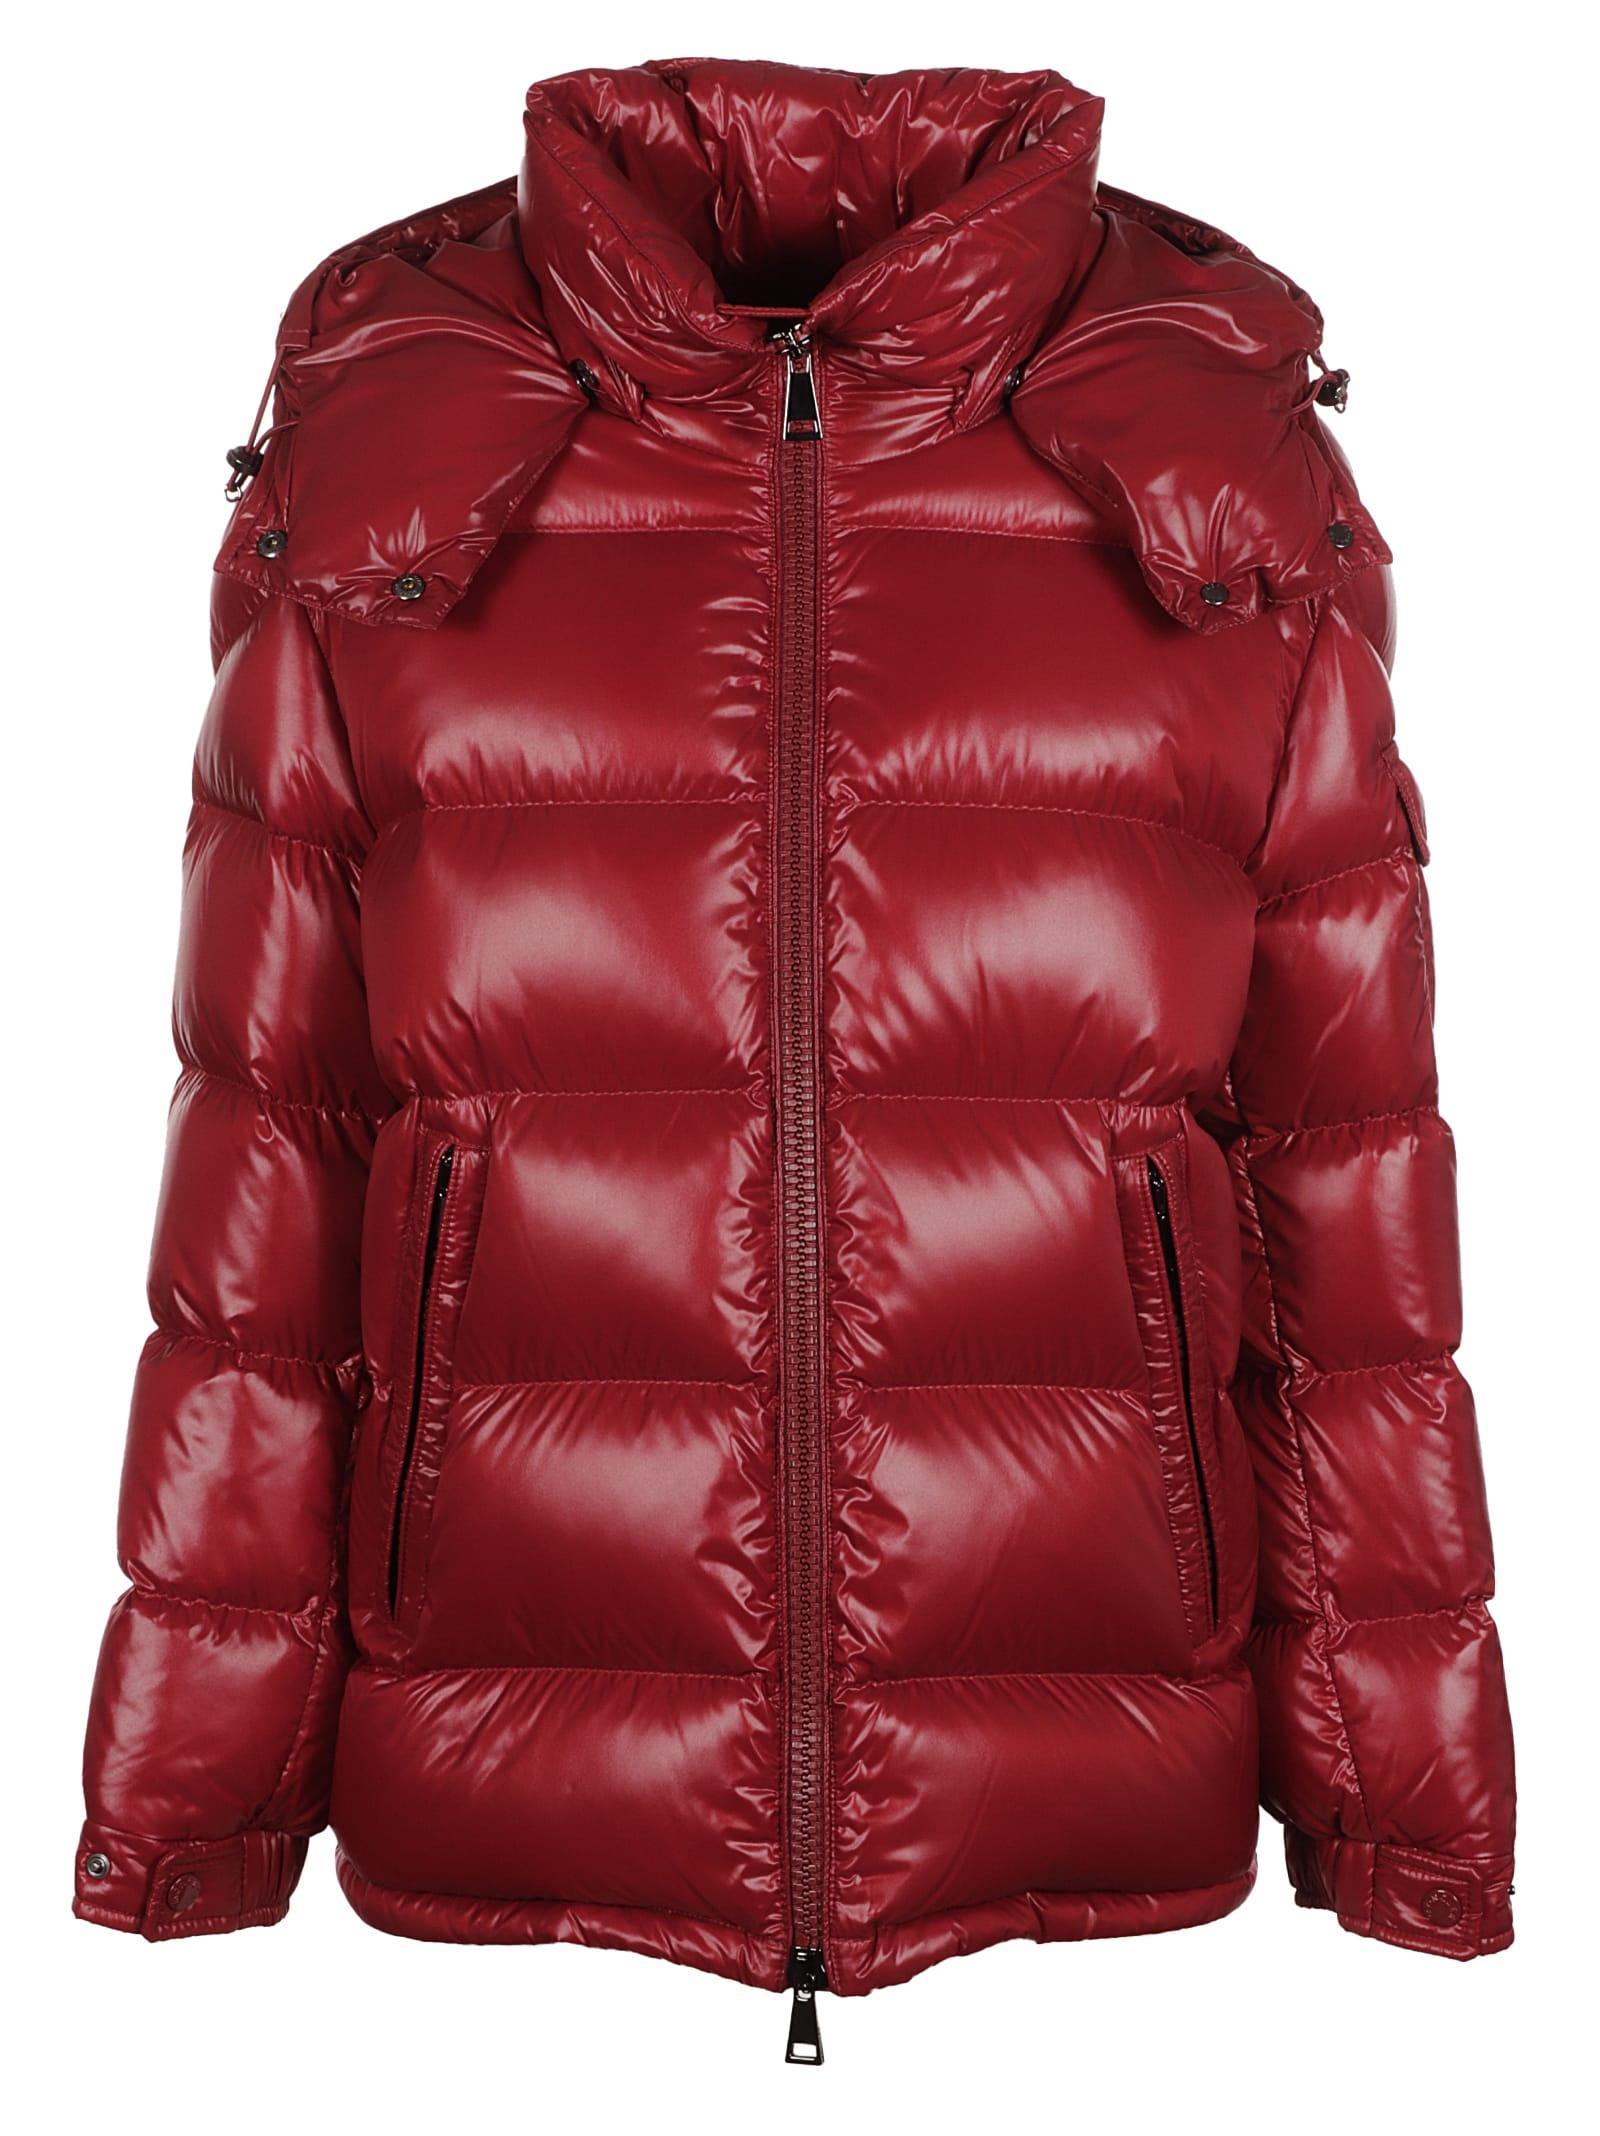 Moncler Fustet Jacket